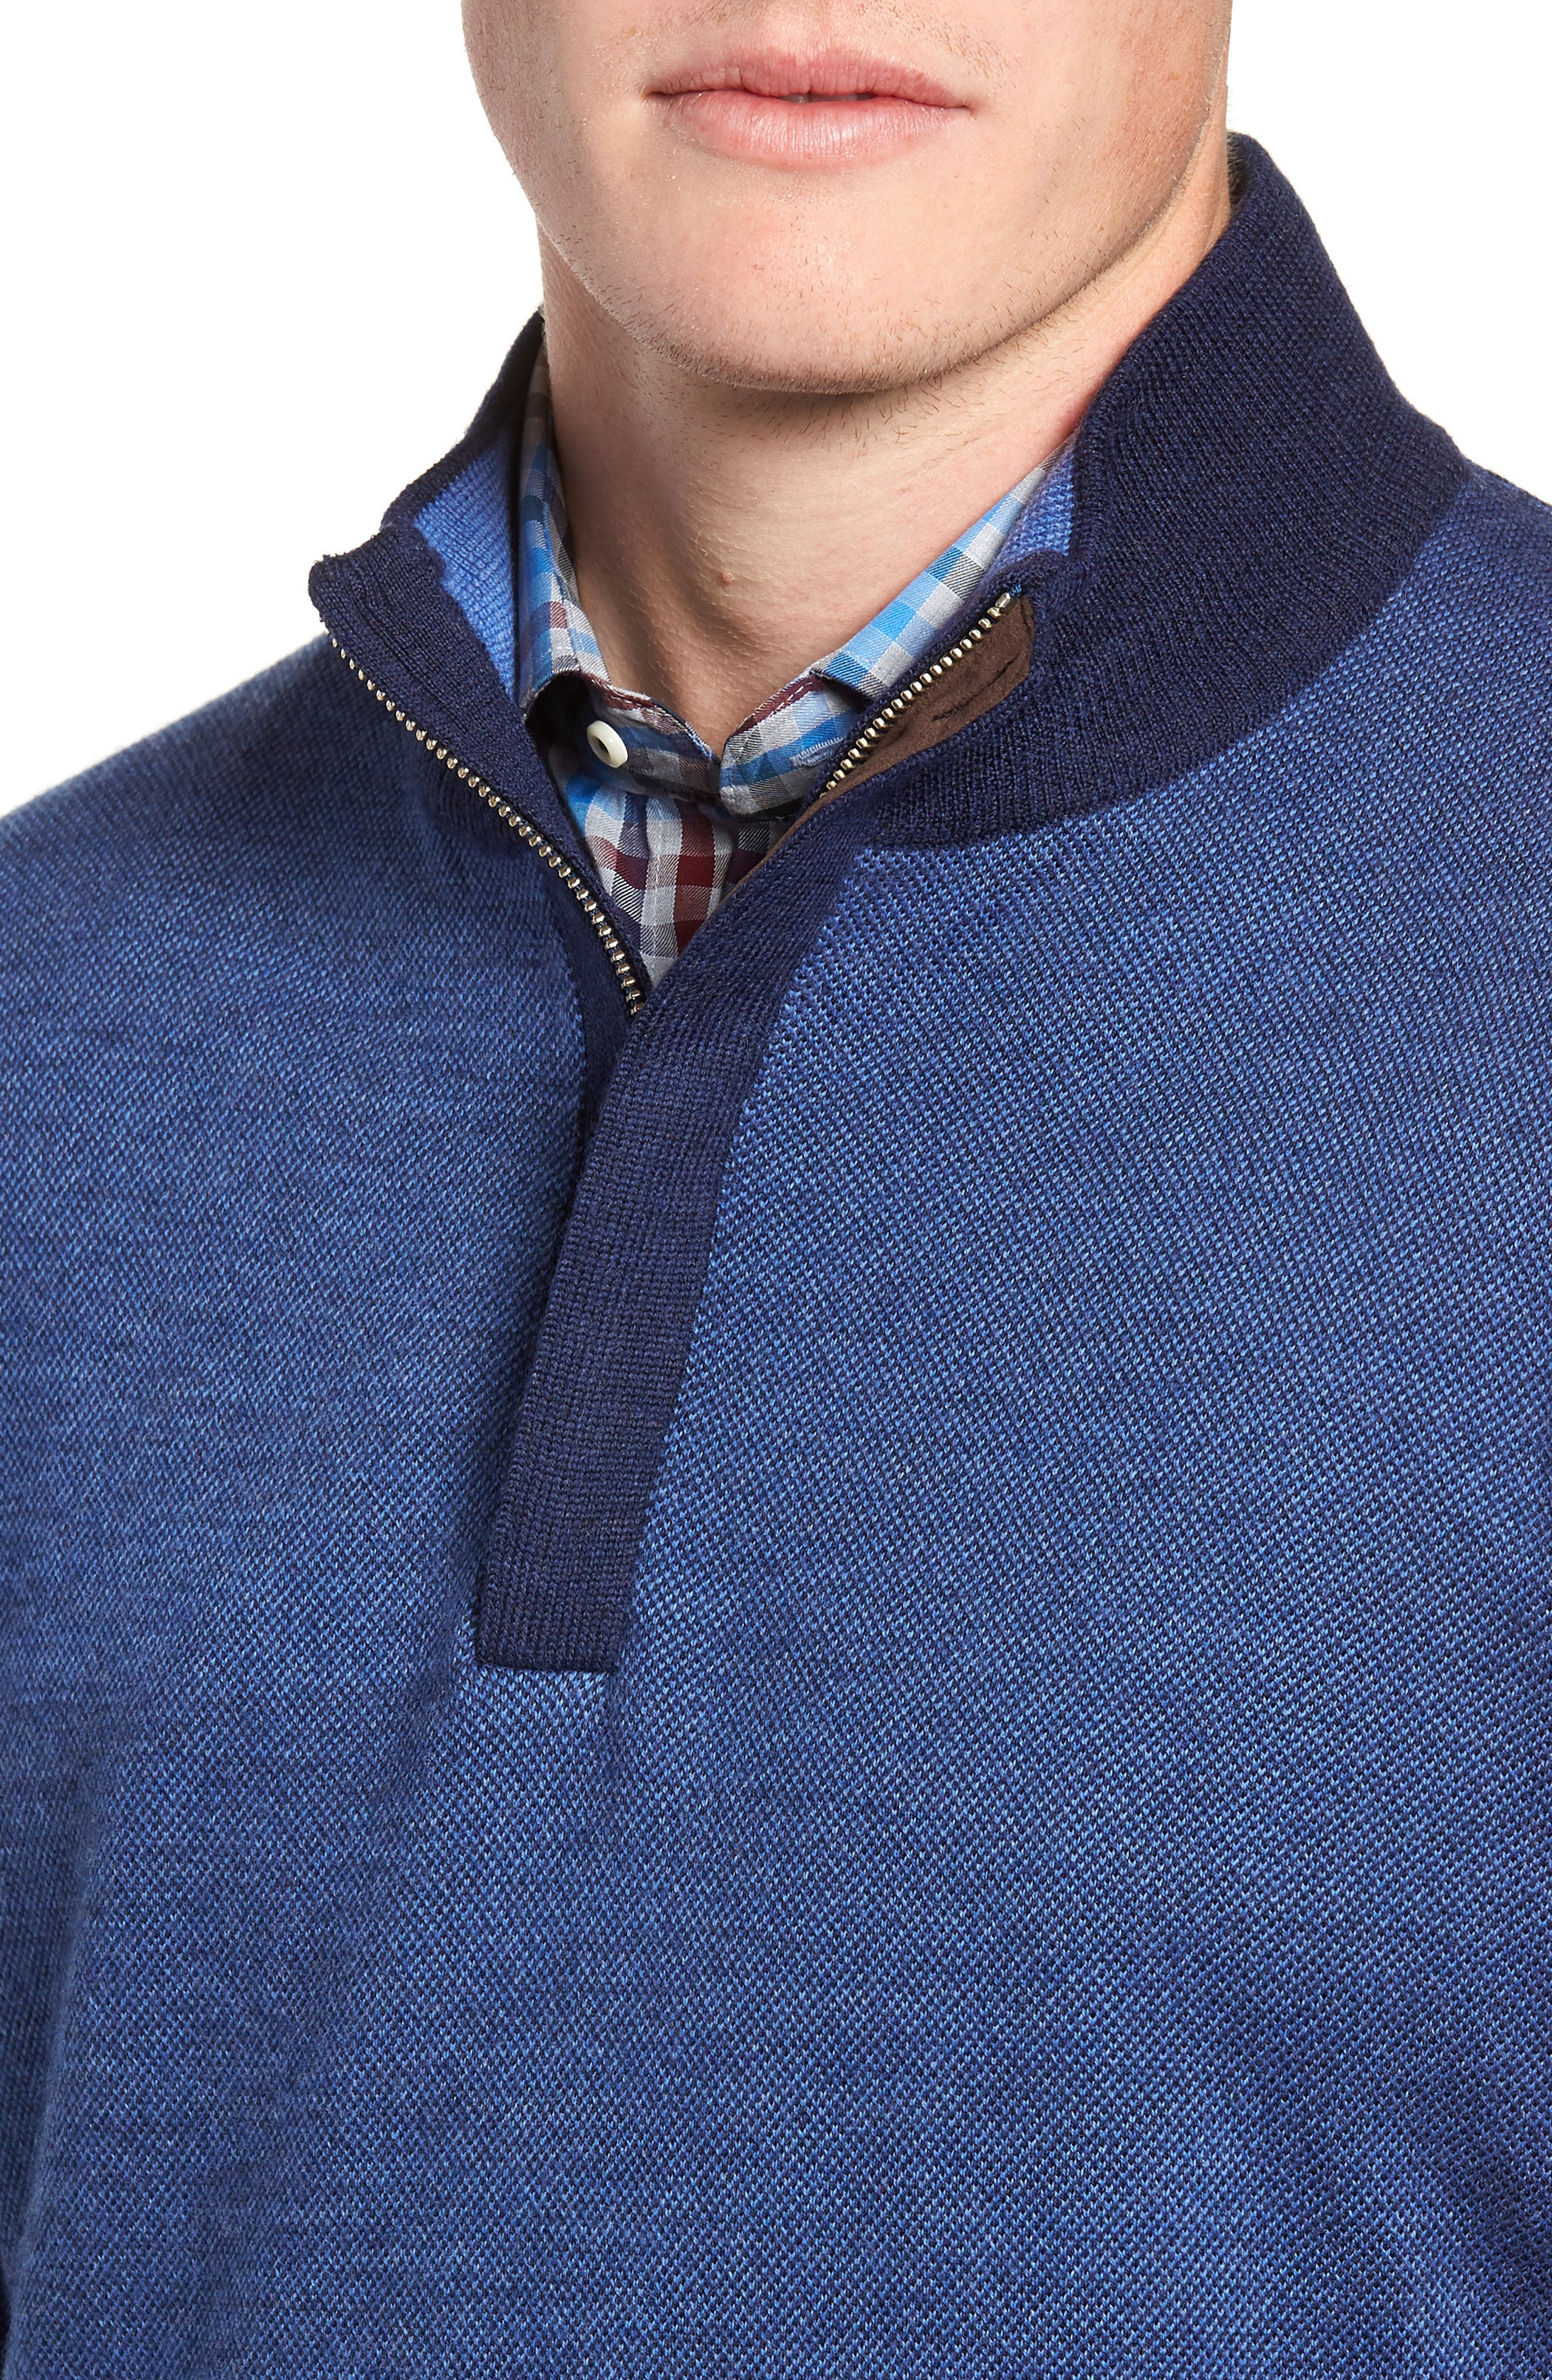 Birdseye Merino Wool Quarter Zip Sweater,                             Alternate thumbnail 4, color,                             PLAZA BLUE